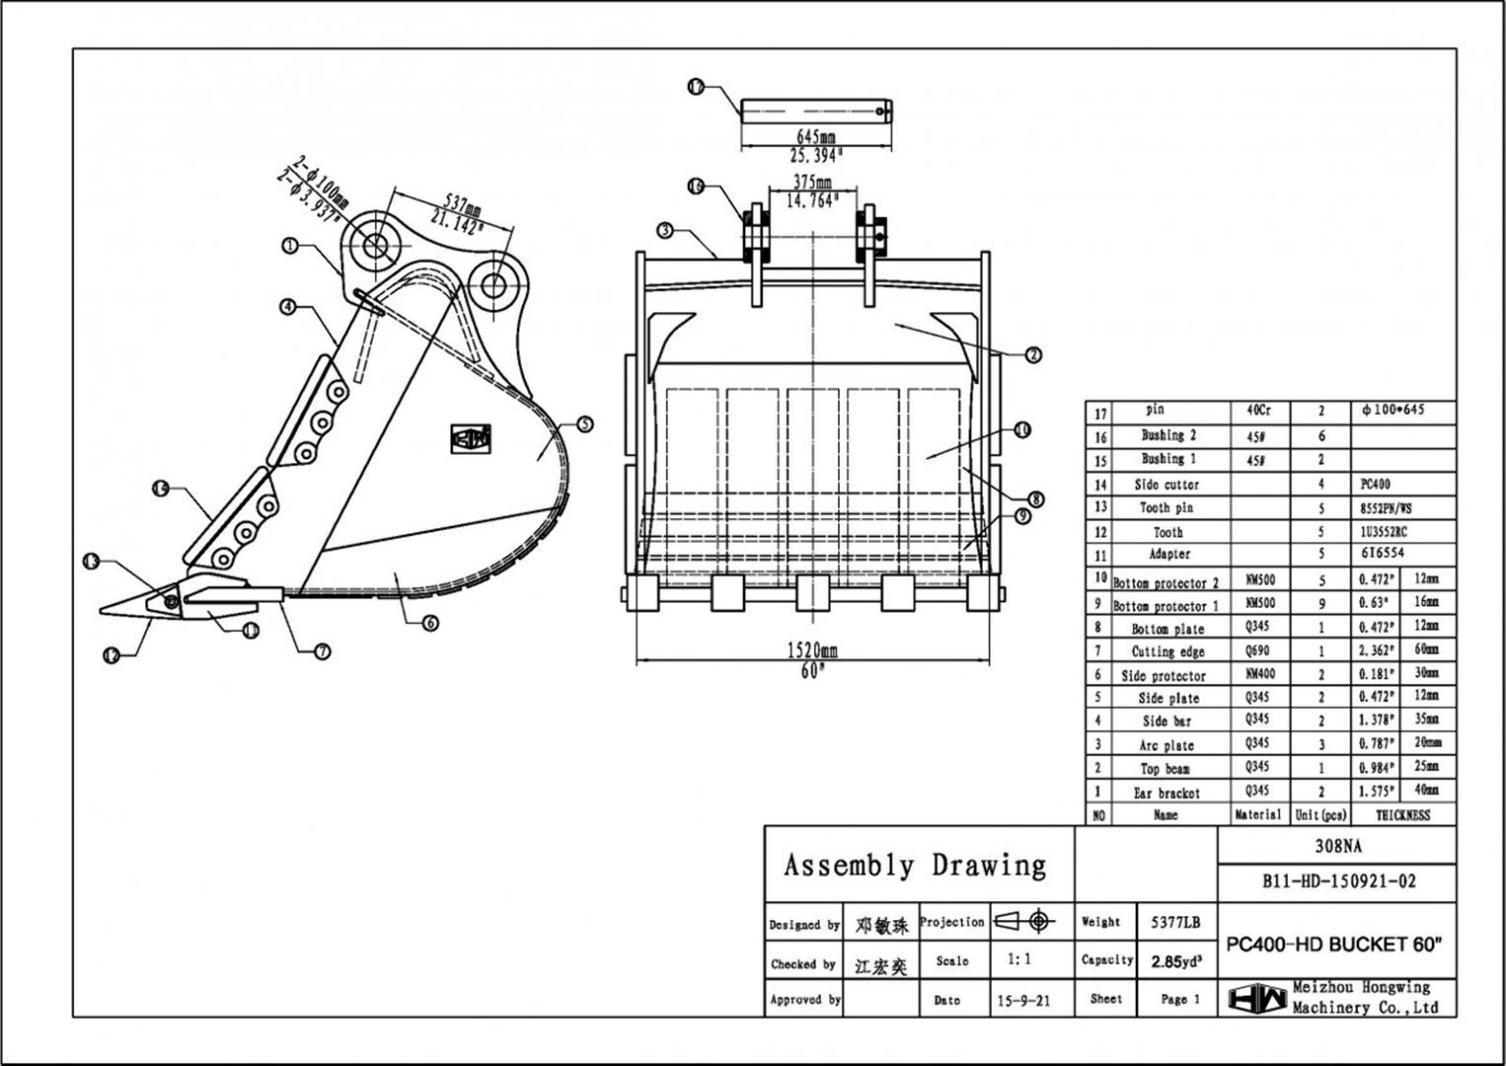 60  u0026quot  heavy duty excavator bucket komatsu pc400  100mm pins